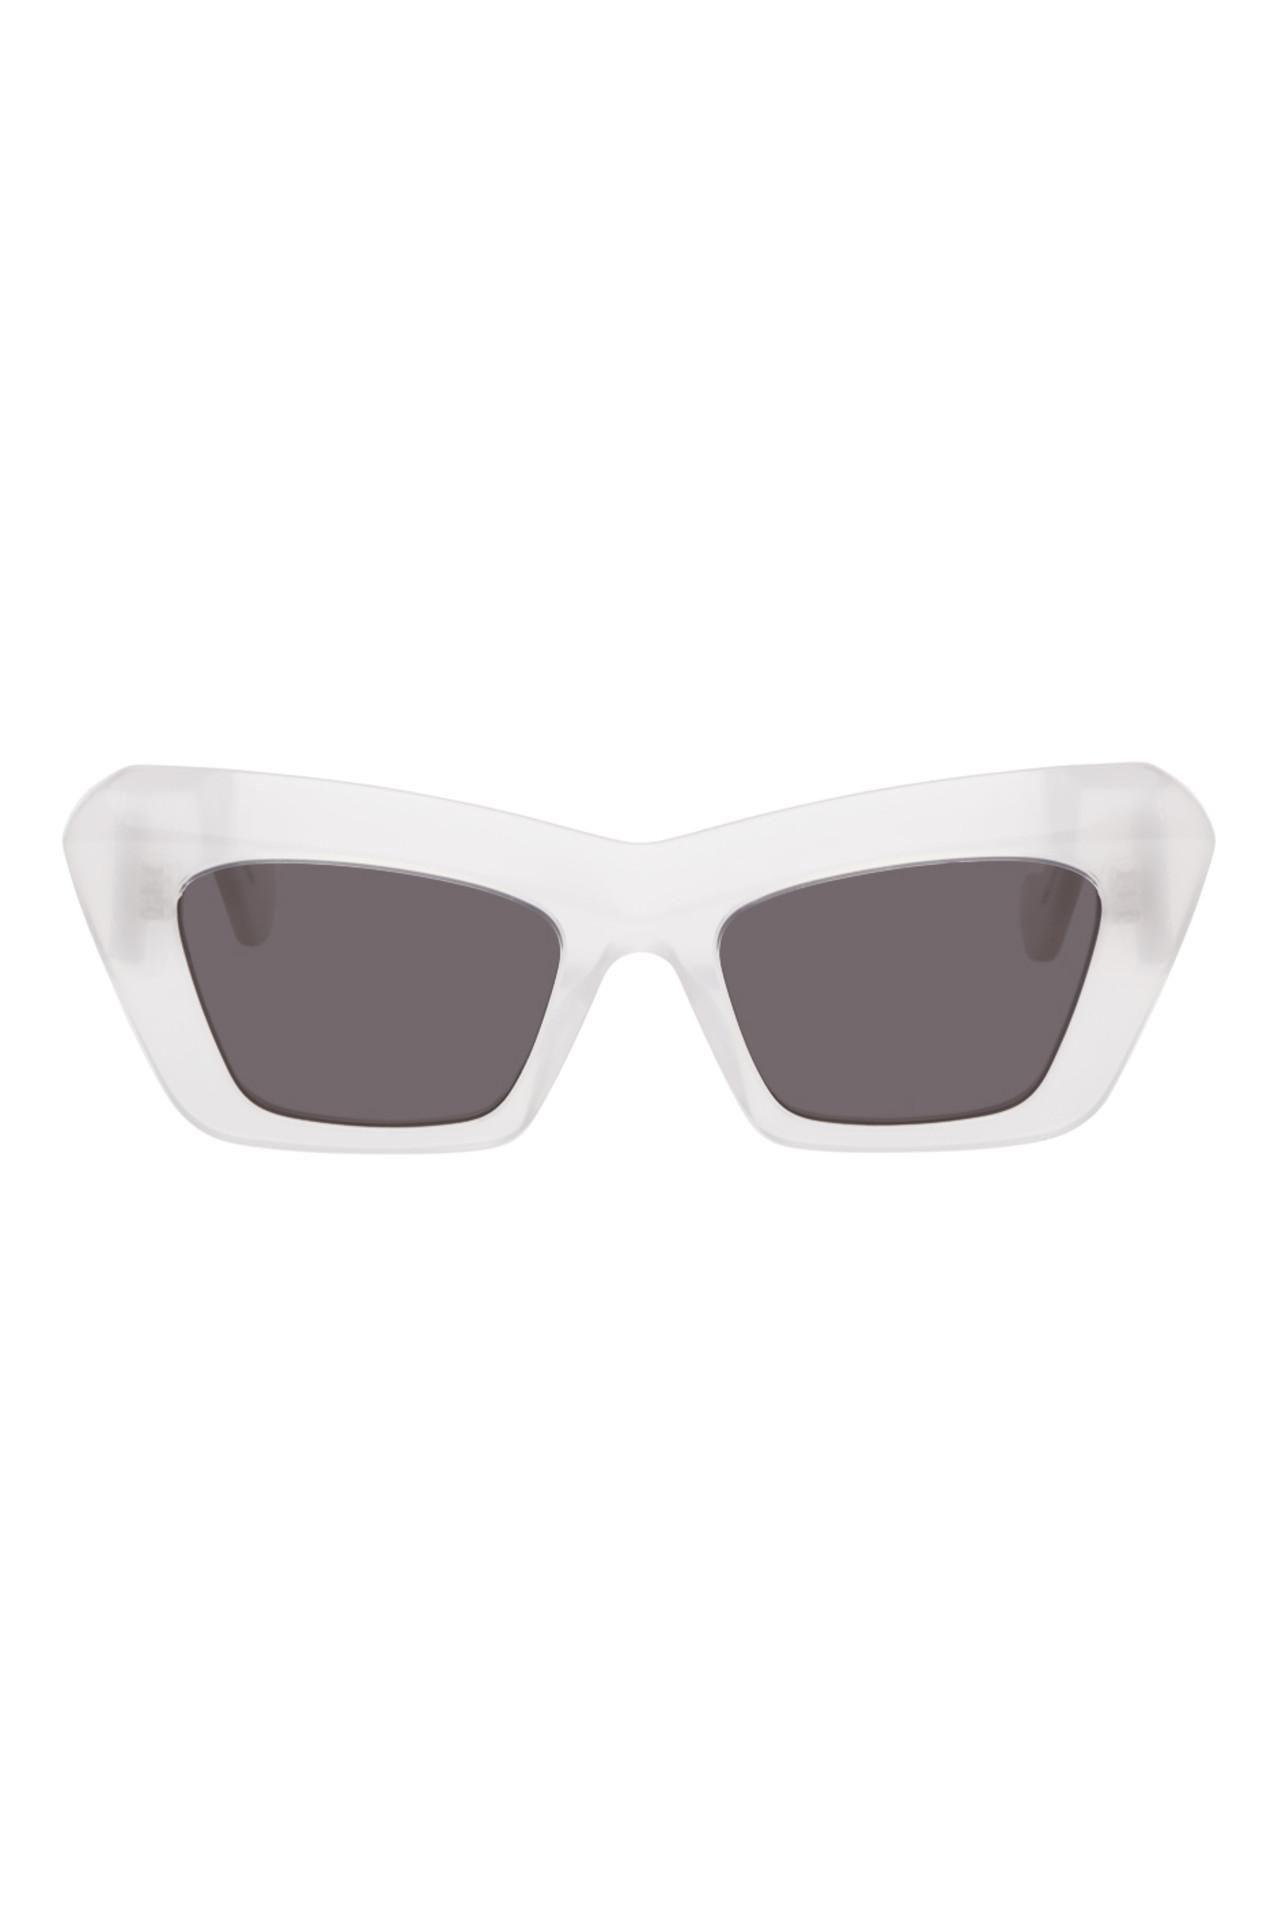 White Oversized Cat-Eye Sunglasses